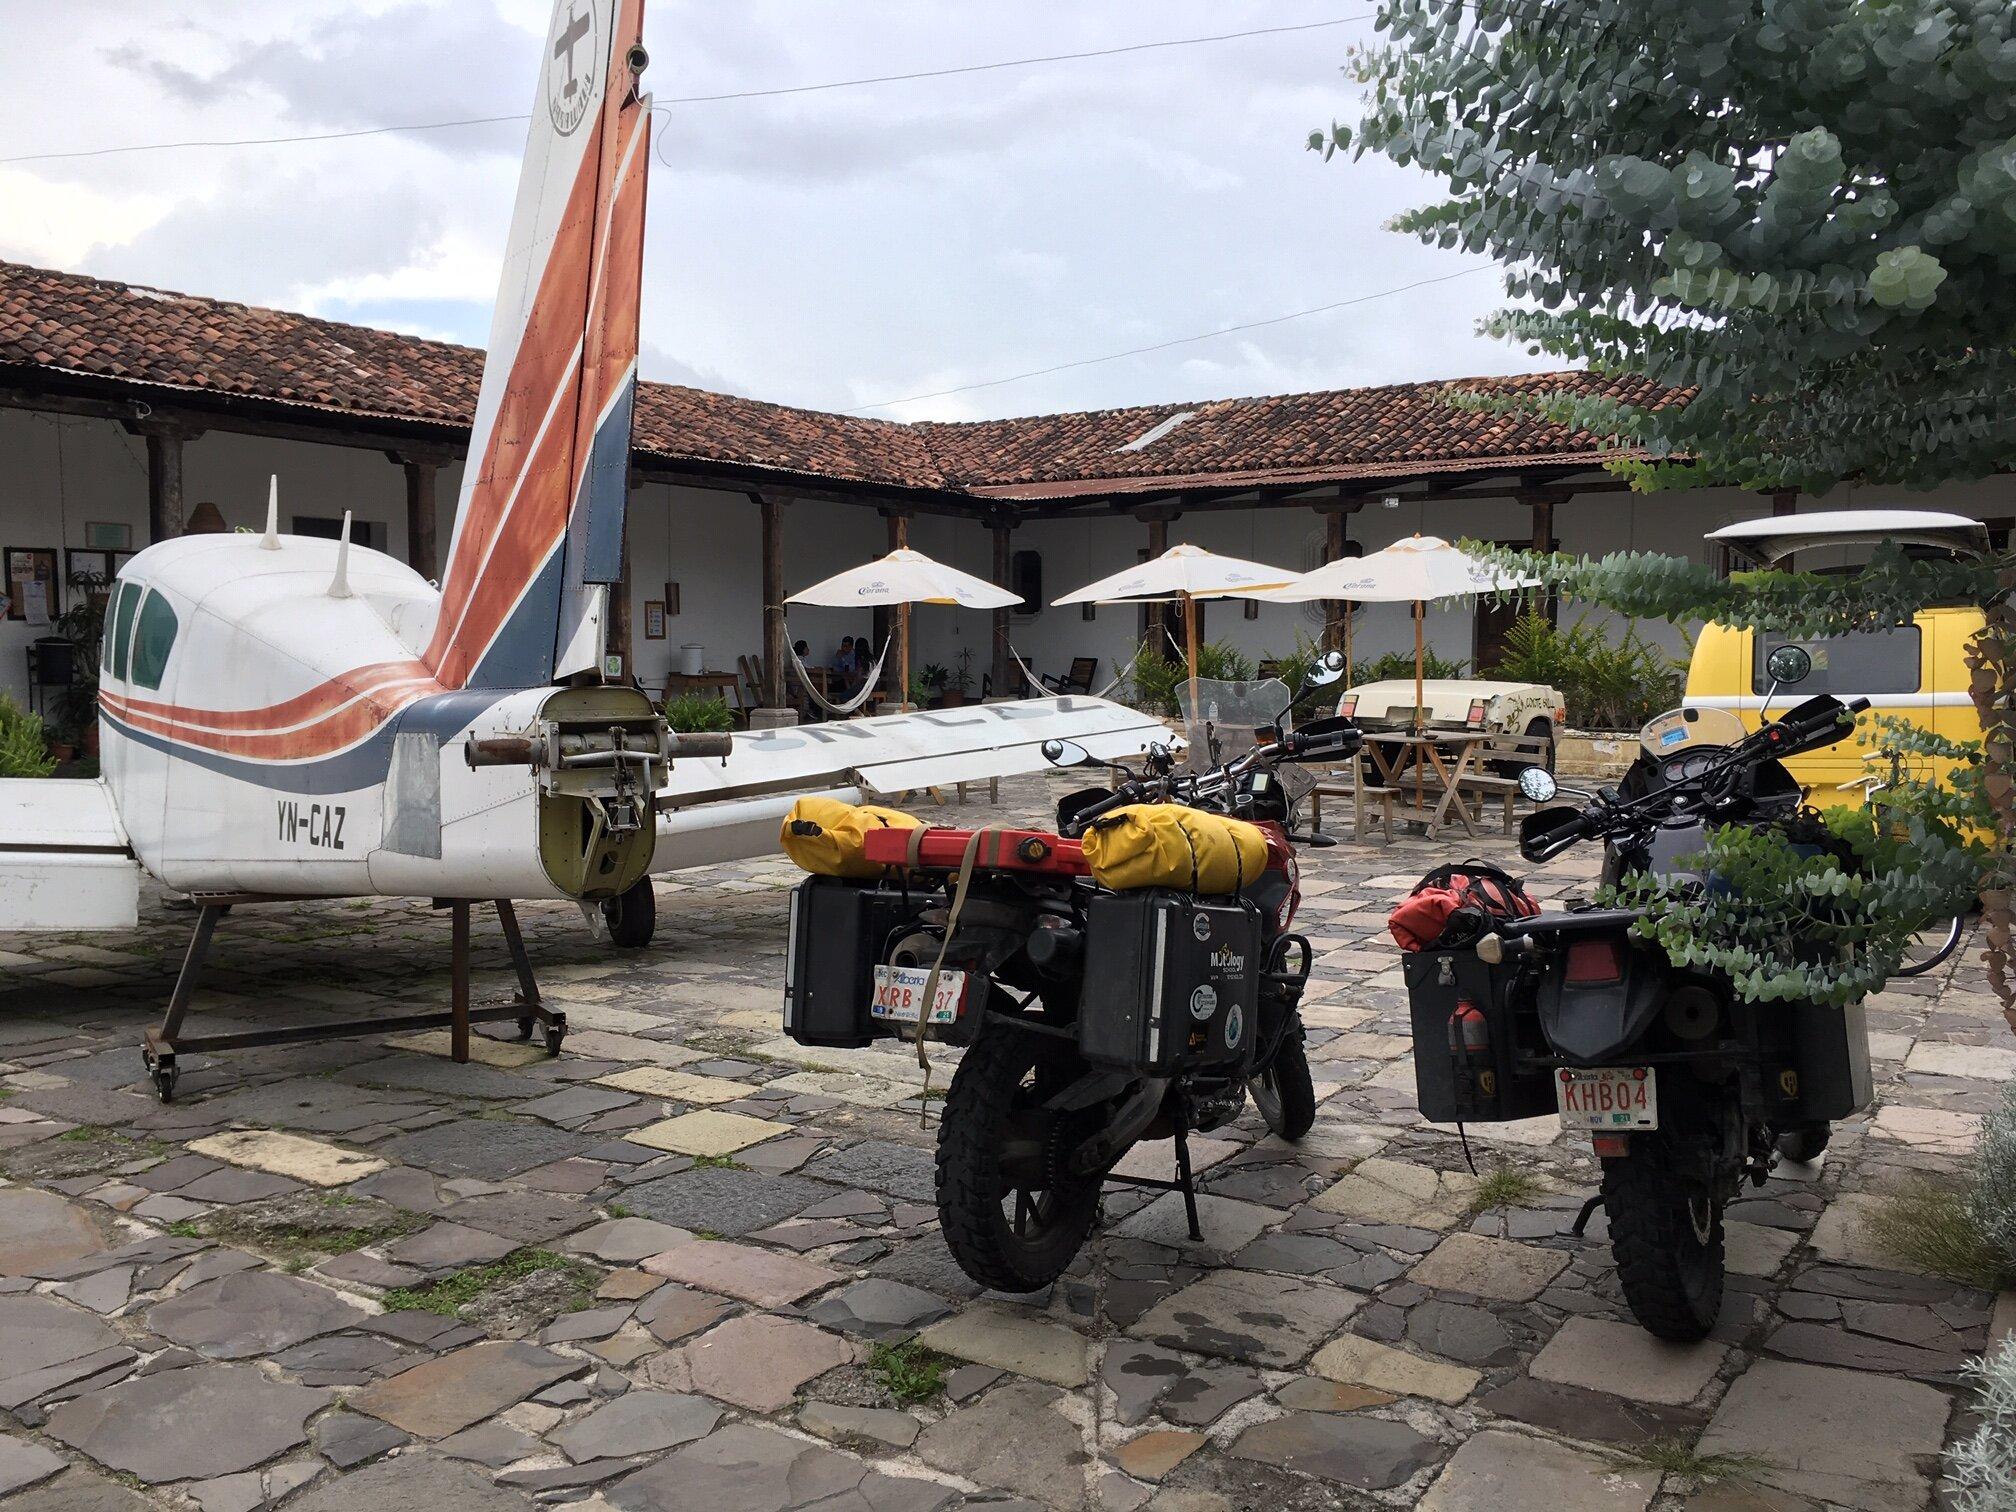 Inside the hostel courtyard, beside the airplane. (Antigua, Guatemala)